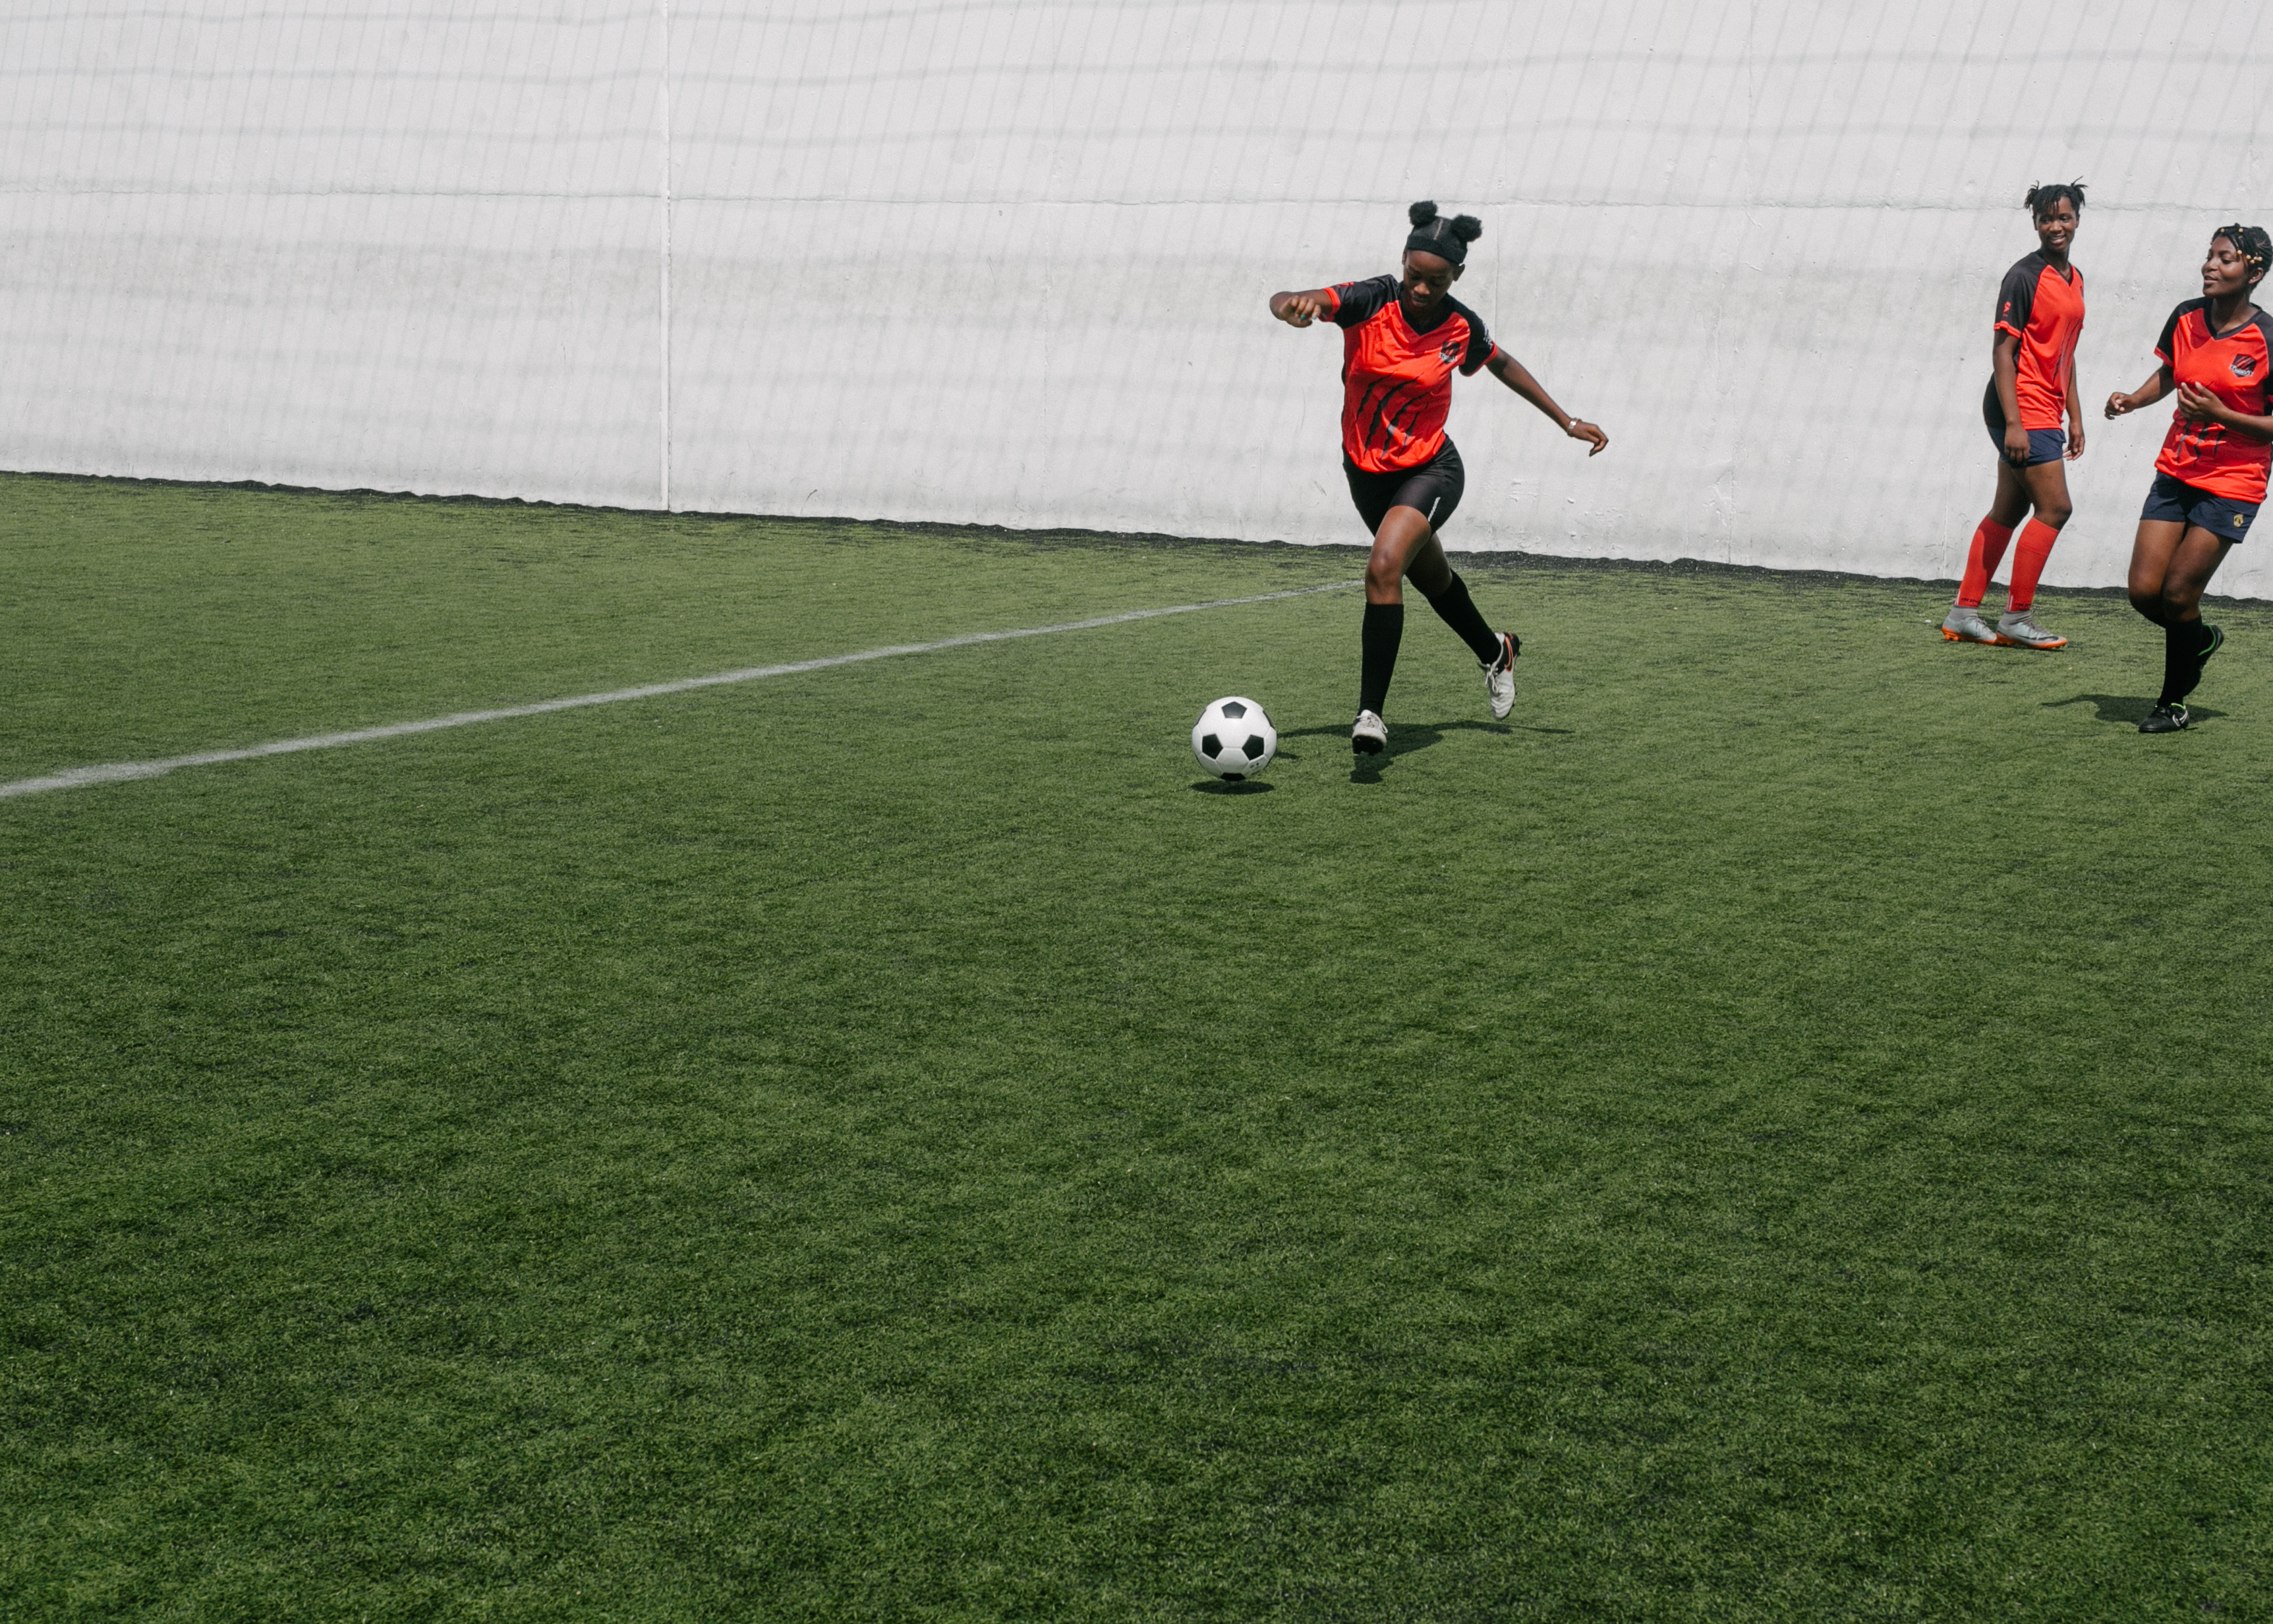 woman kicking ball during football match